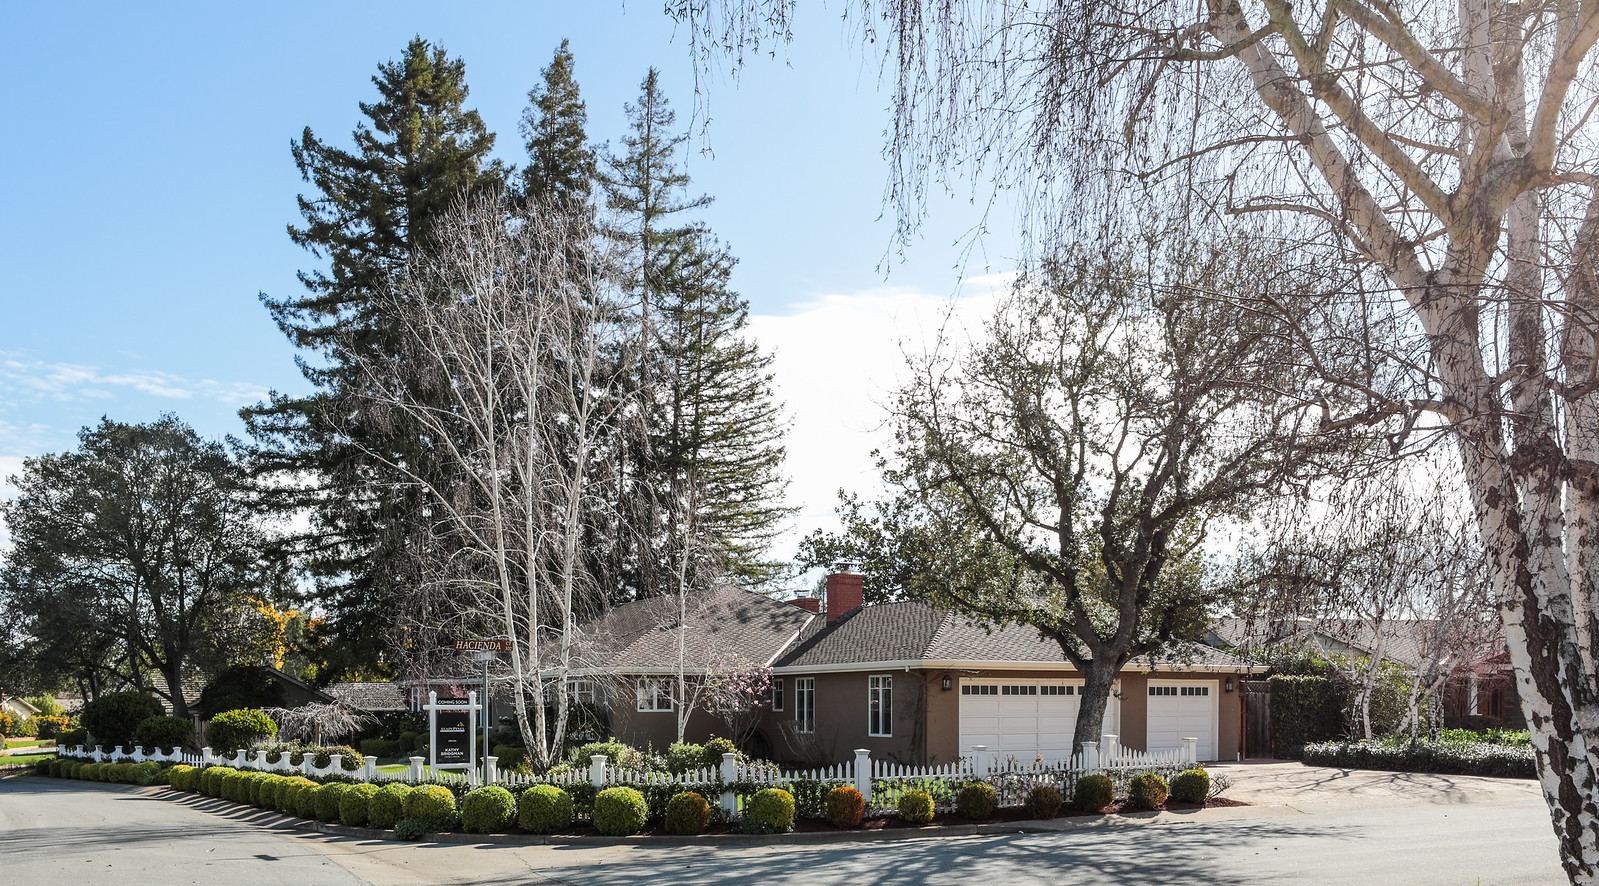 380 Hacienda Exterior Blu Skye Media-5204-X3.jpg